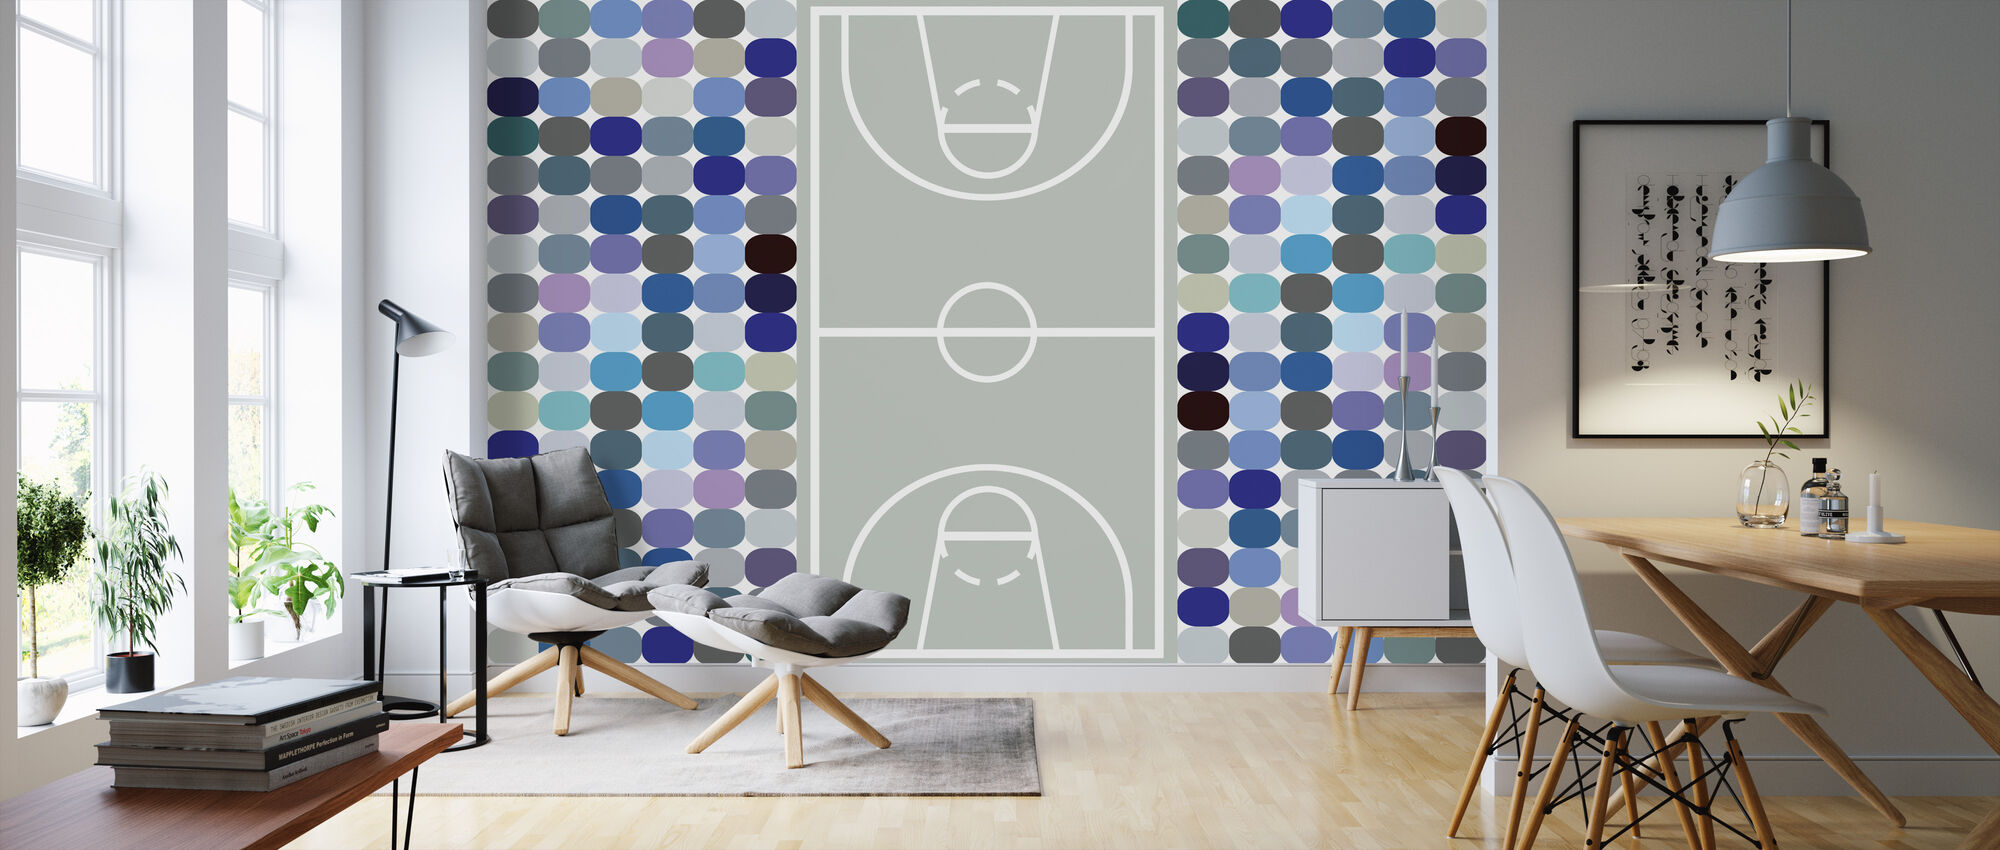 Basketbal - Behang - Woonkamer